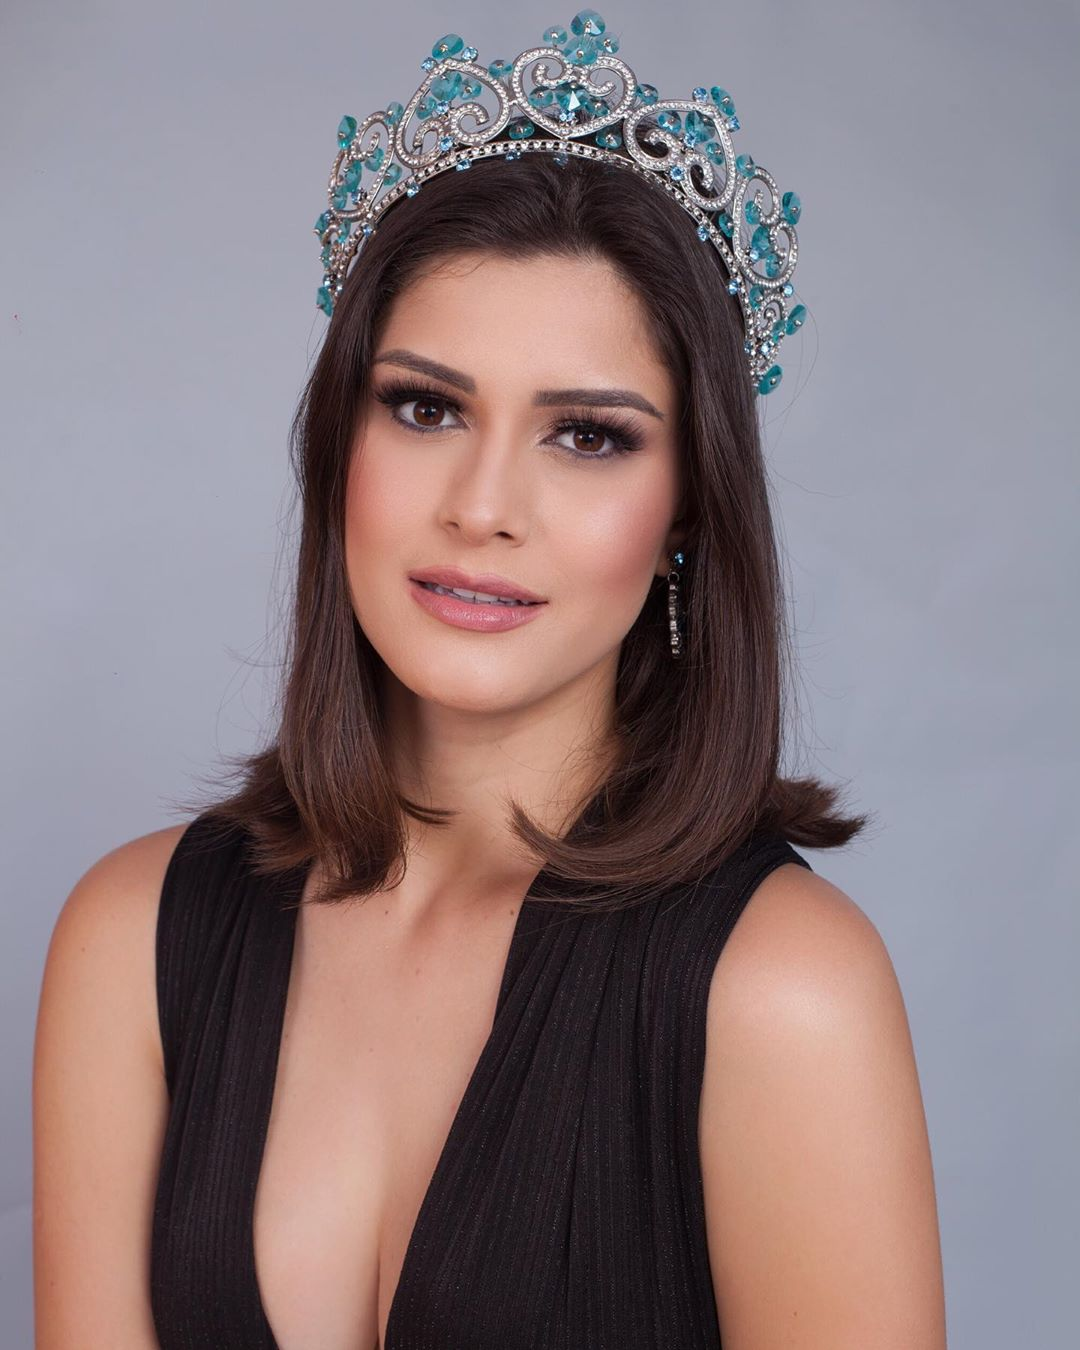 elis miele, top 5 de miss world 2019. - Página 3 65302911